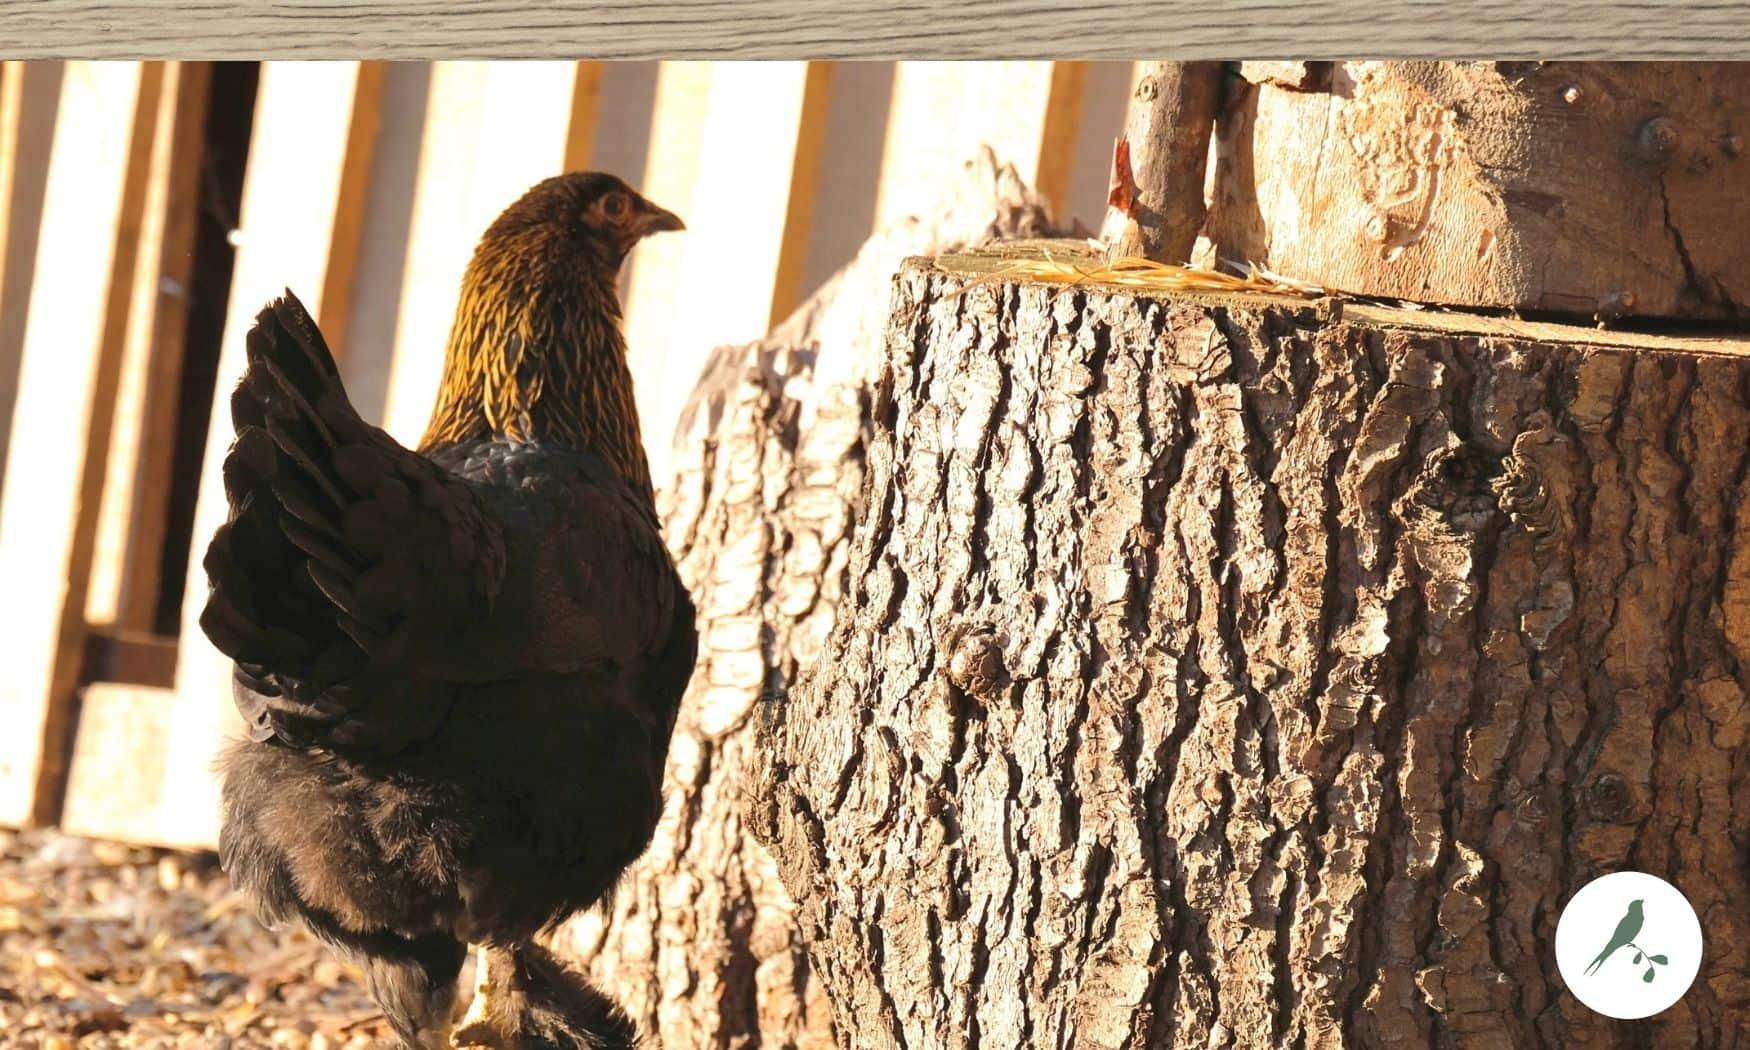 de Kleine Wildenberg -boerderij vakantie - kippen - eitje rapen